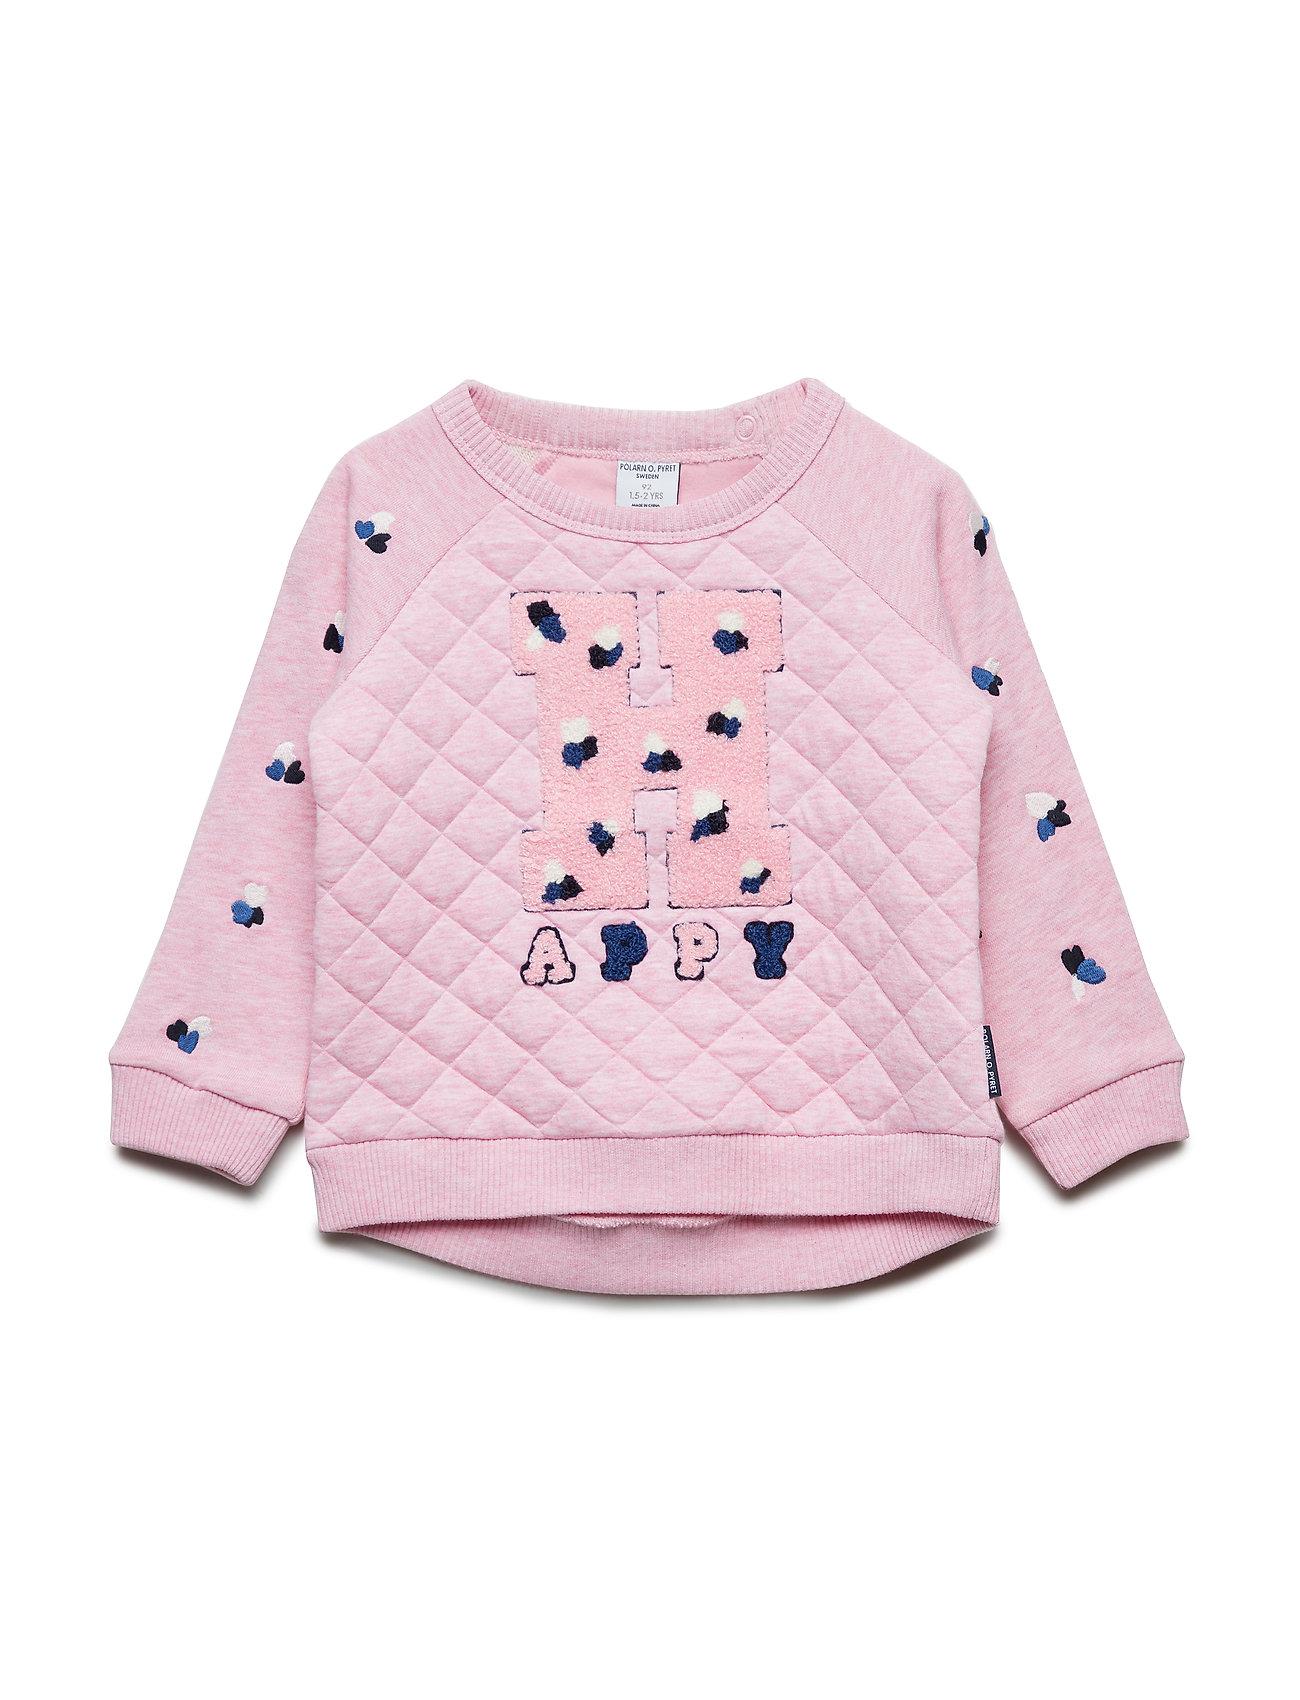 Polarn O. Pyret Sweater embroidery Preschool